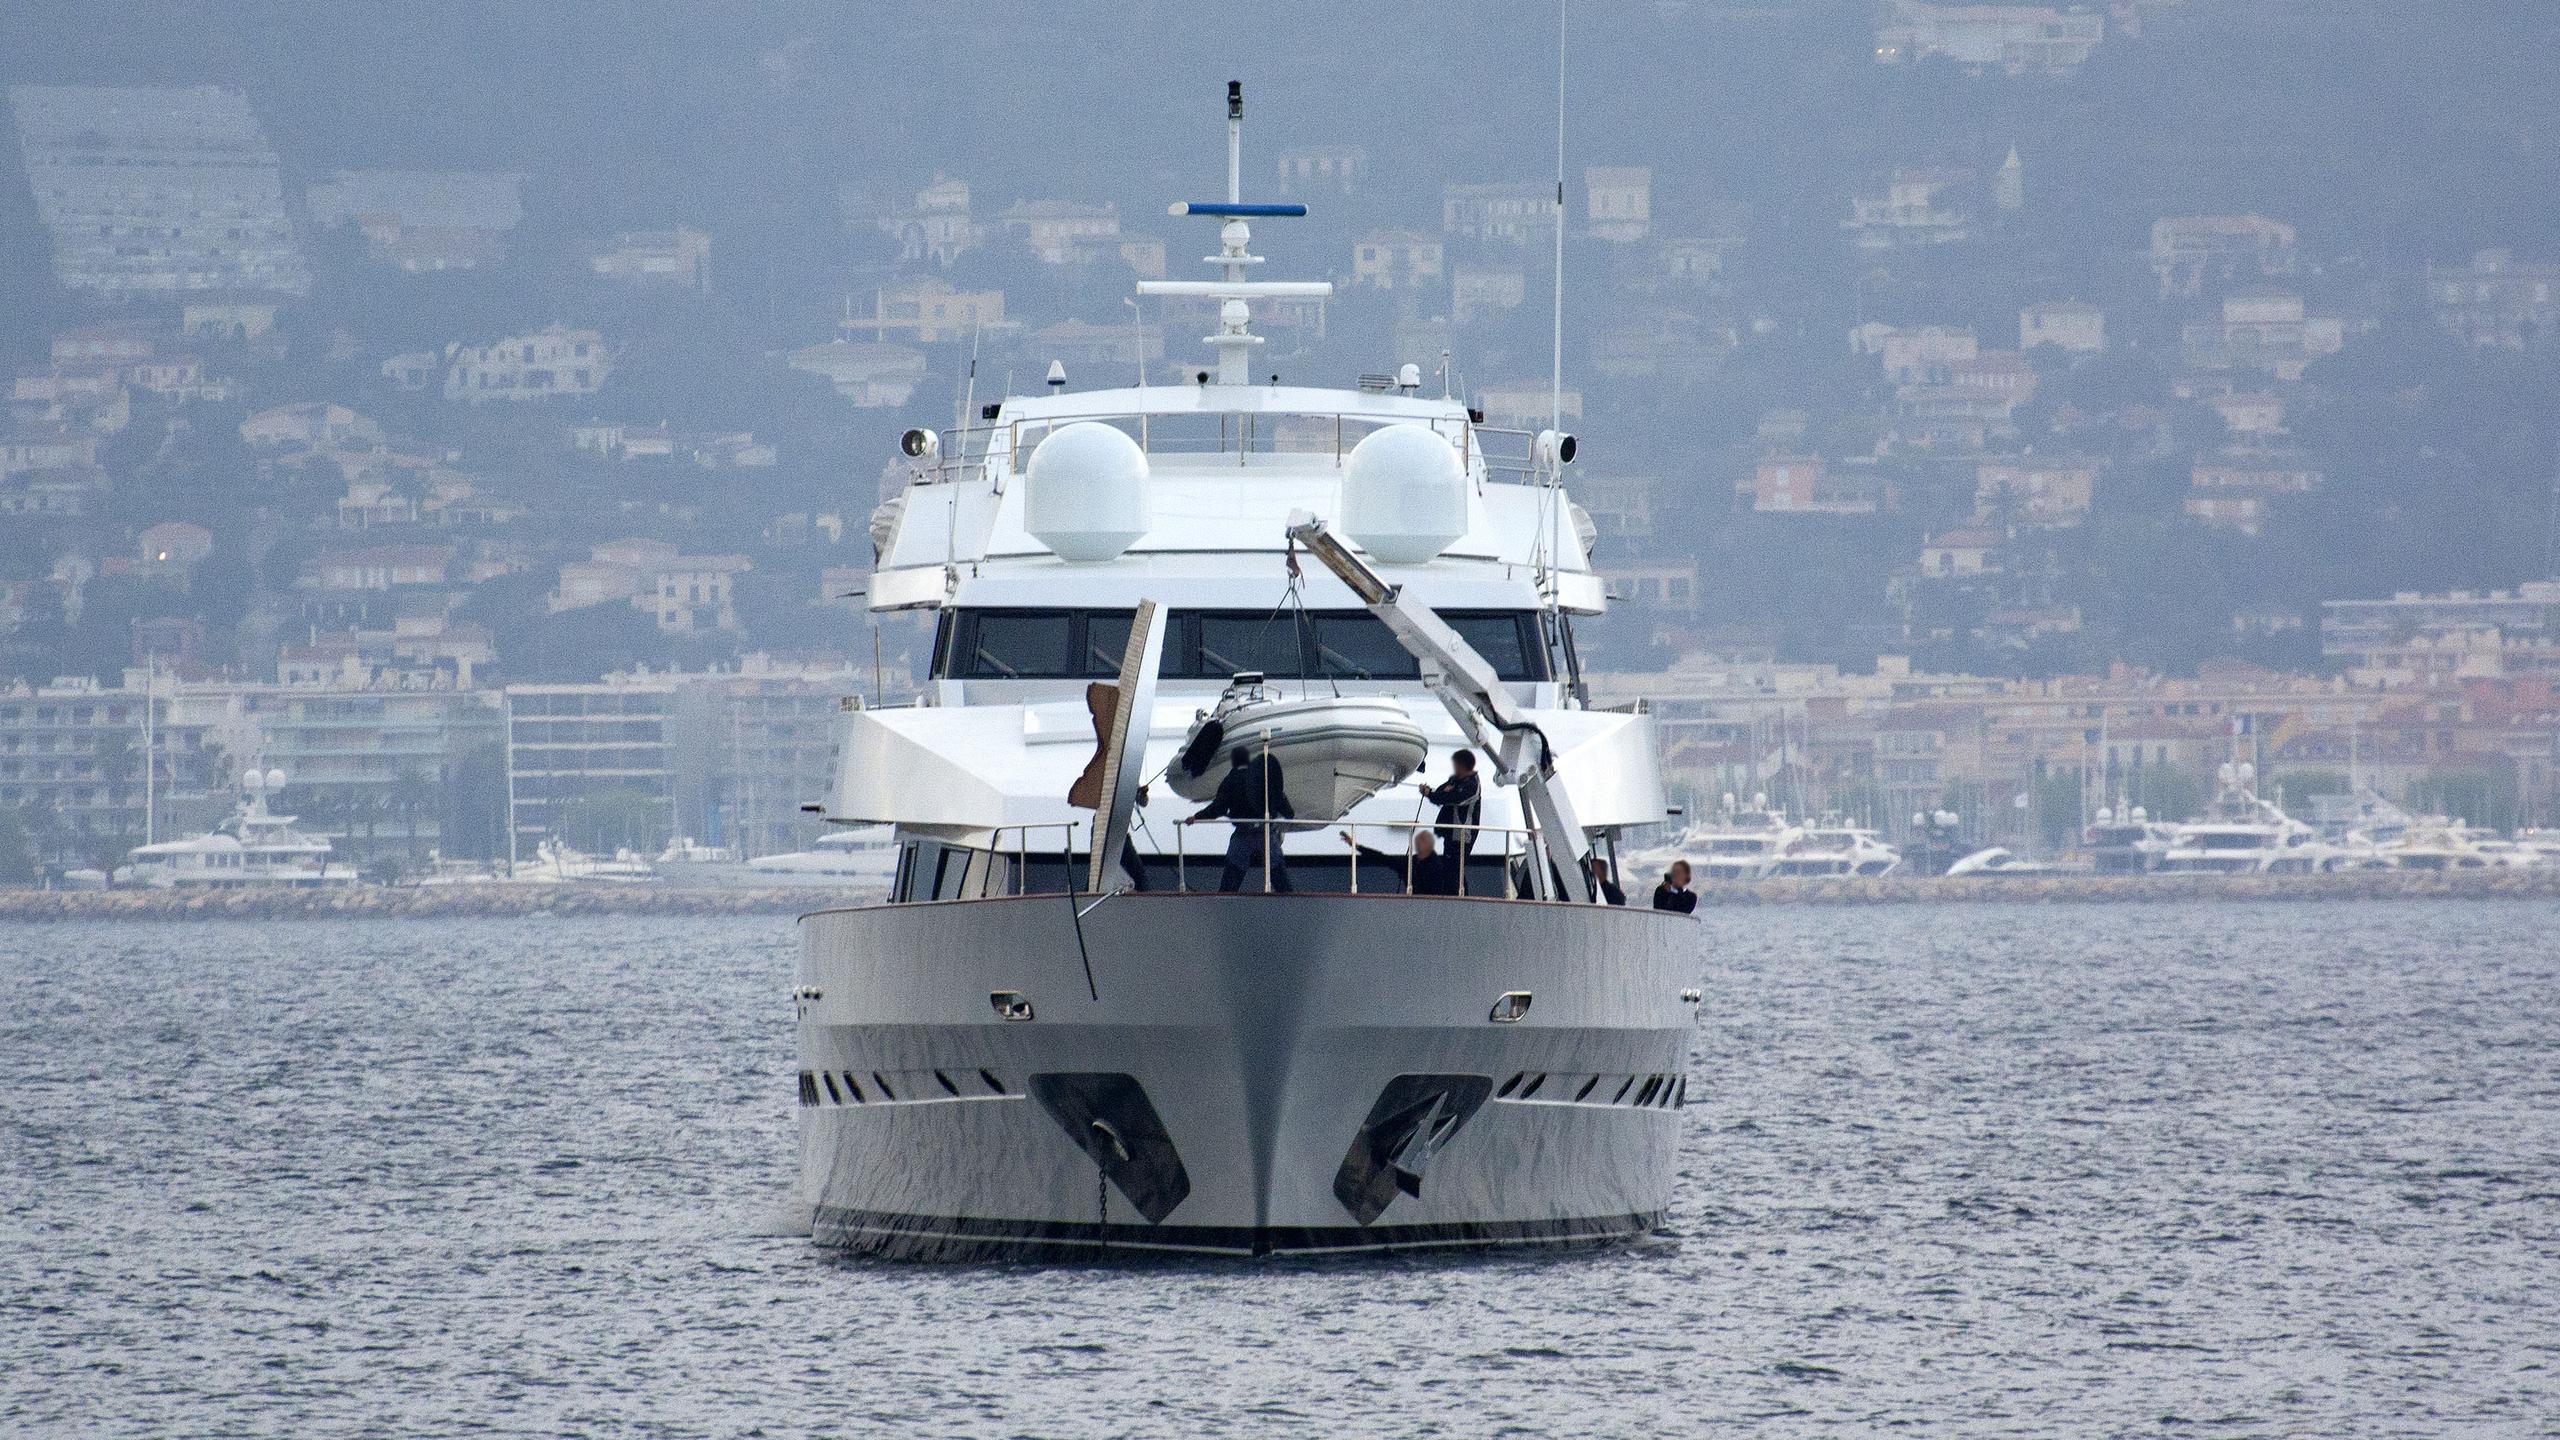 miraggio-motor-yacht-siar-moschini-1988-41m-bow